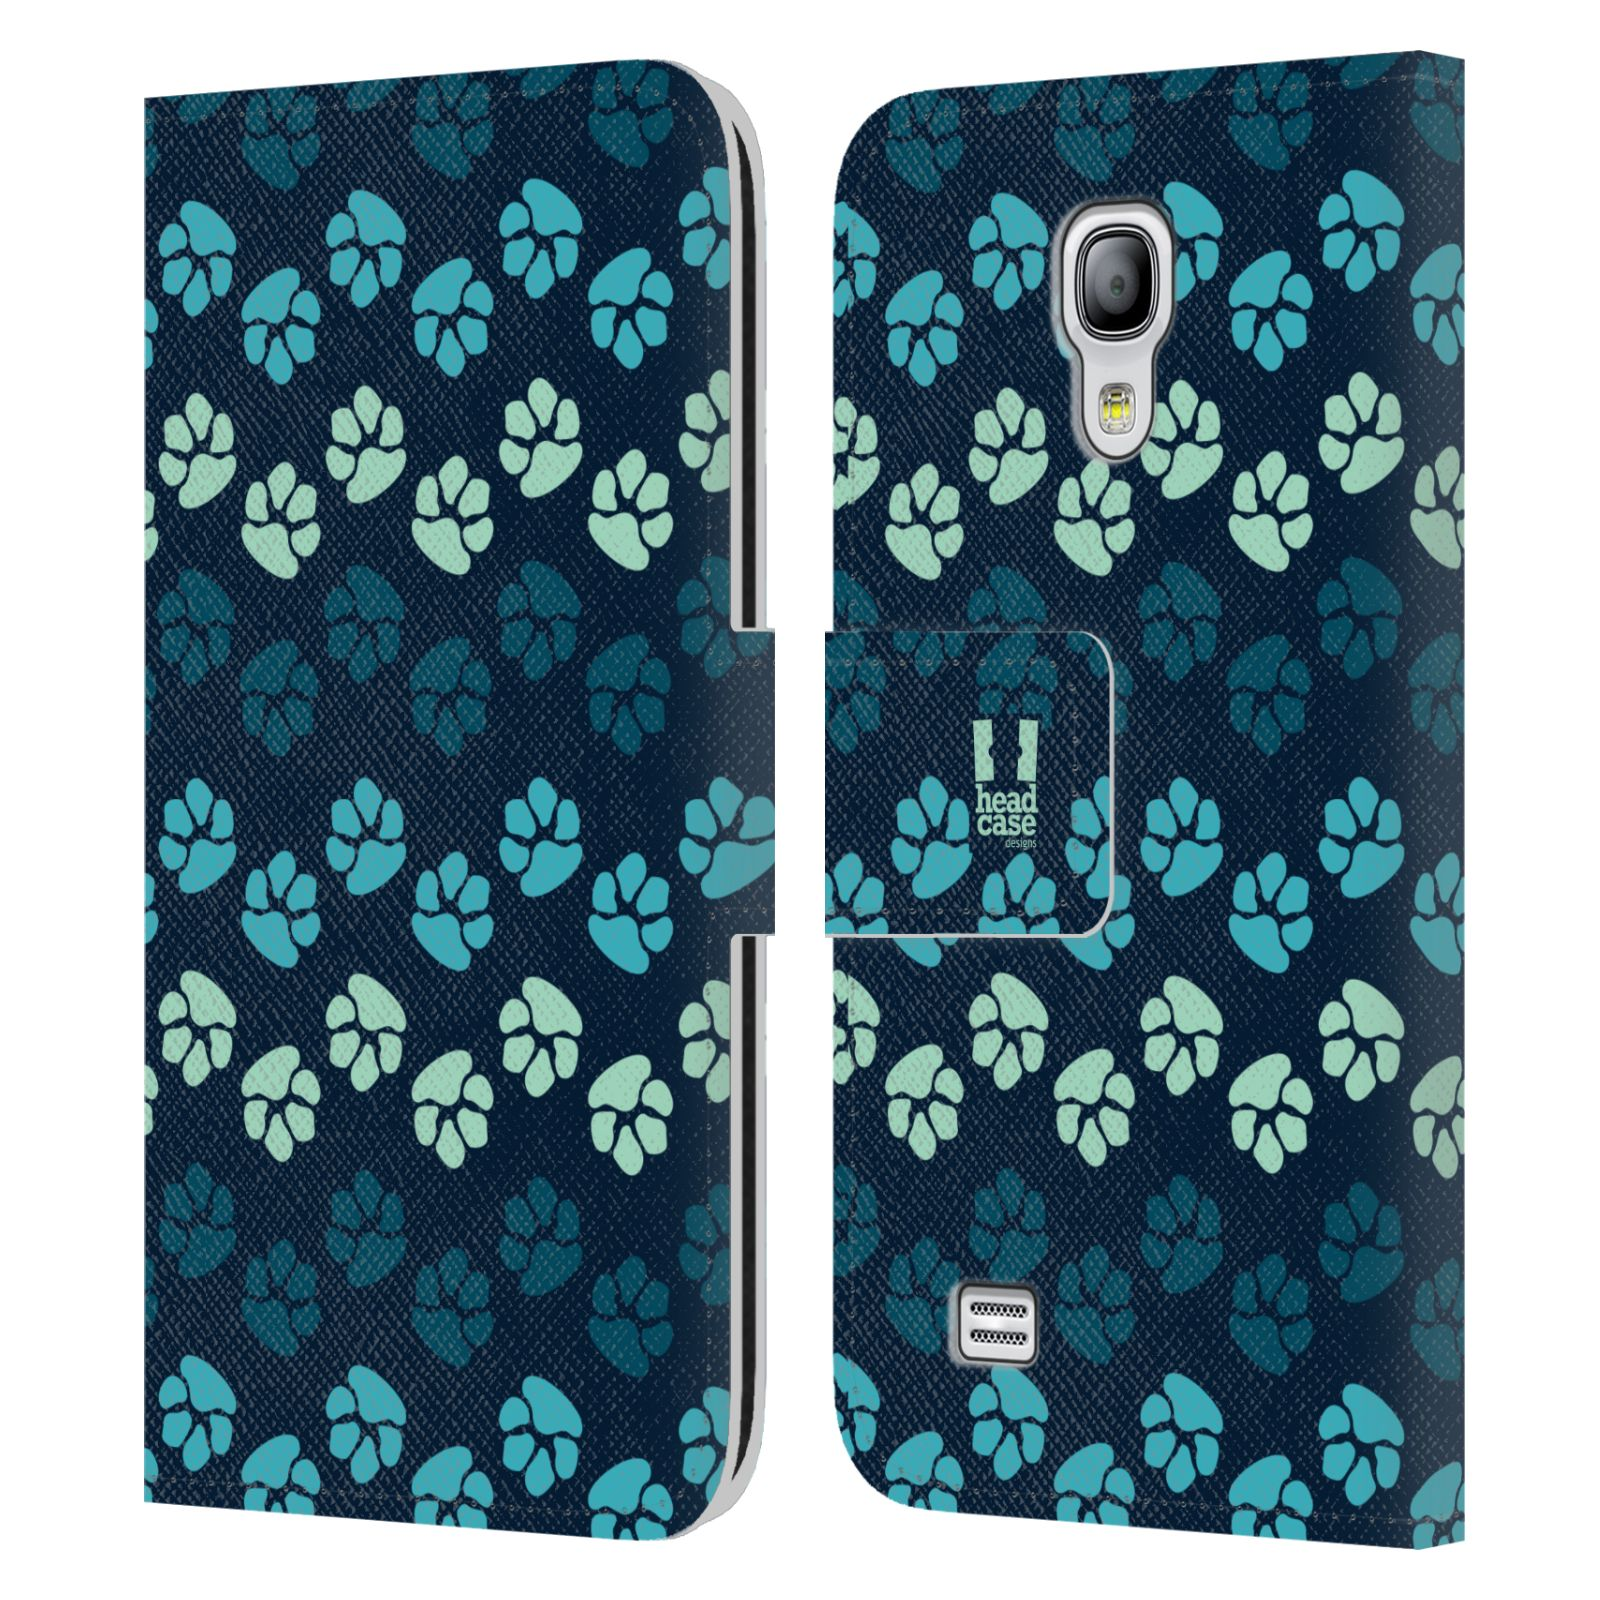 HEAD CASE Flipové pouzdro pro mobil Samsung Galaxy S4 MINI / S4 MINI DUOS Pejsek ťapky modrá barva